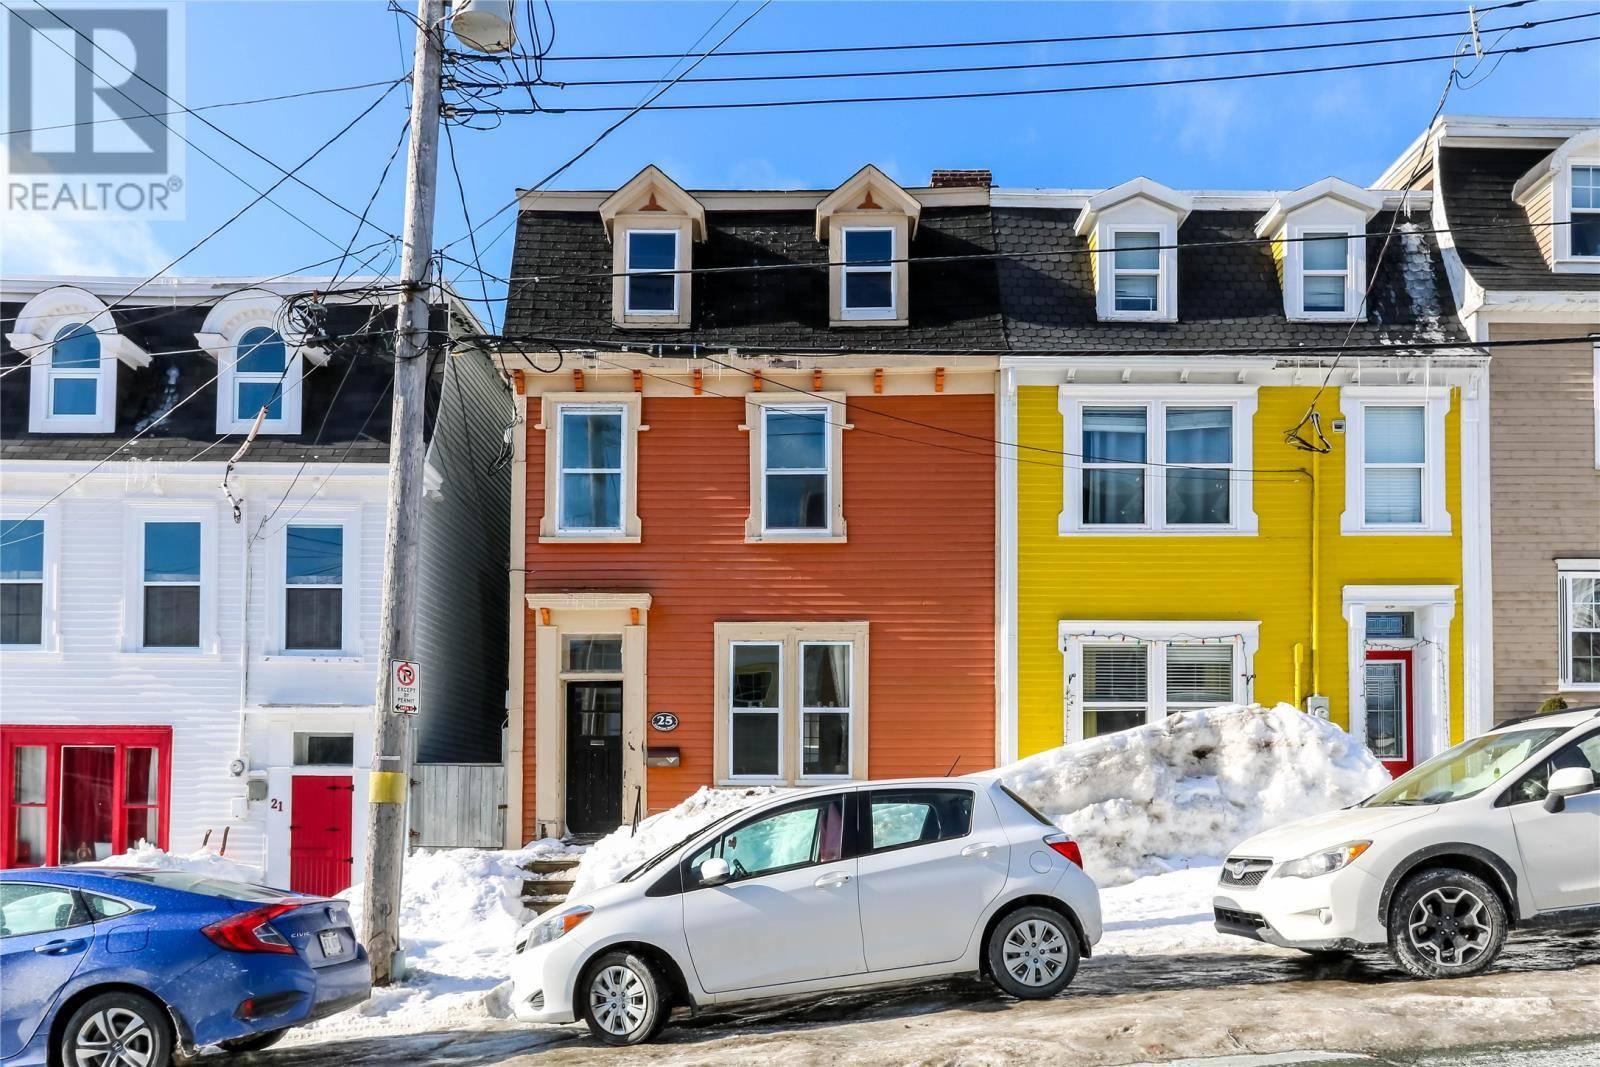 House for sale at 25 Cochrane St St. John's Newfoundland - MLS: 1211662